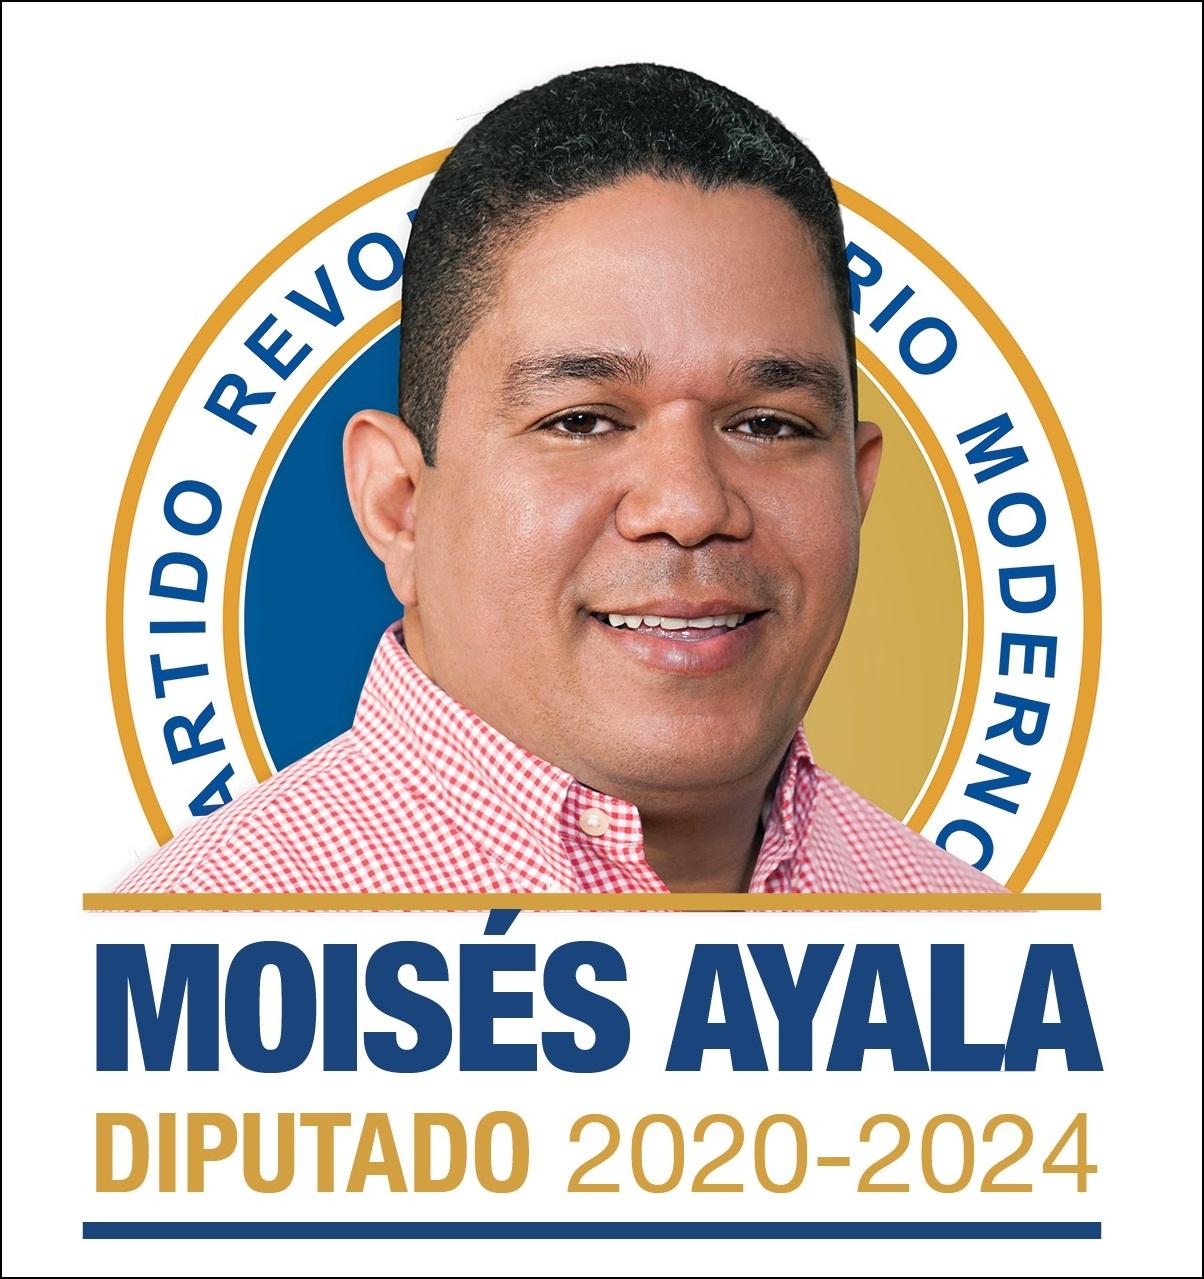 DR. MOISÉS AYALA PÉREZ, Diputado PRM provincia Barahona 2020-2024